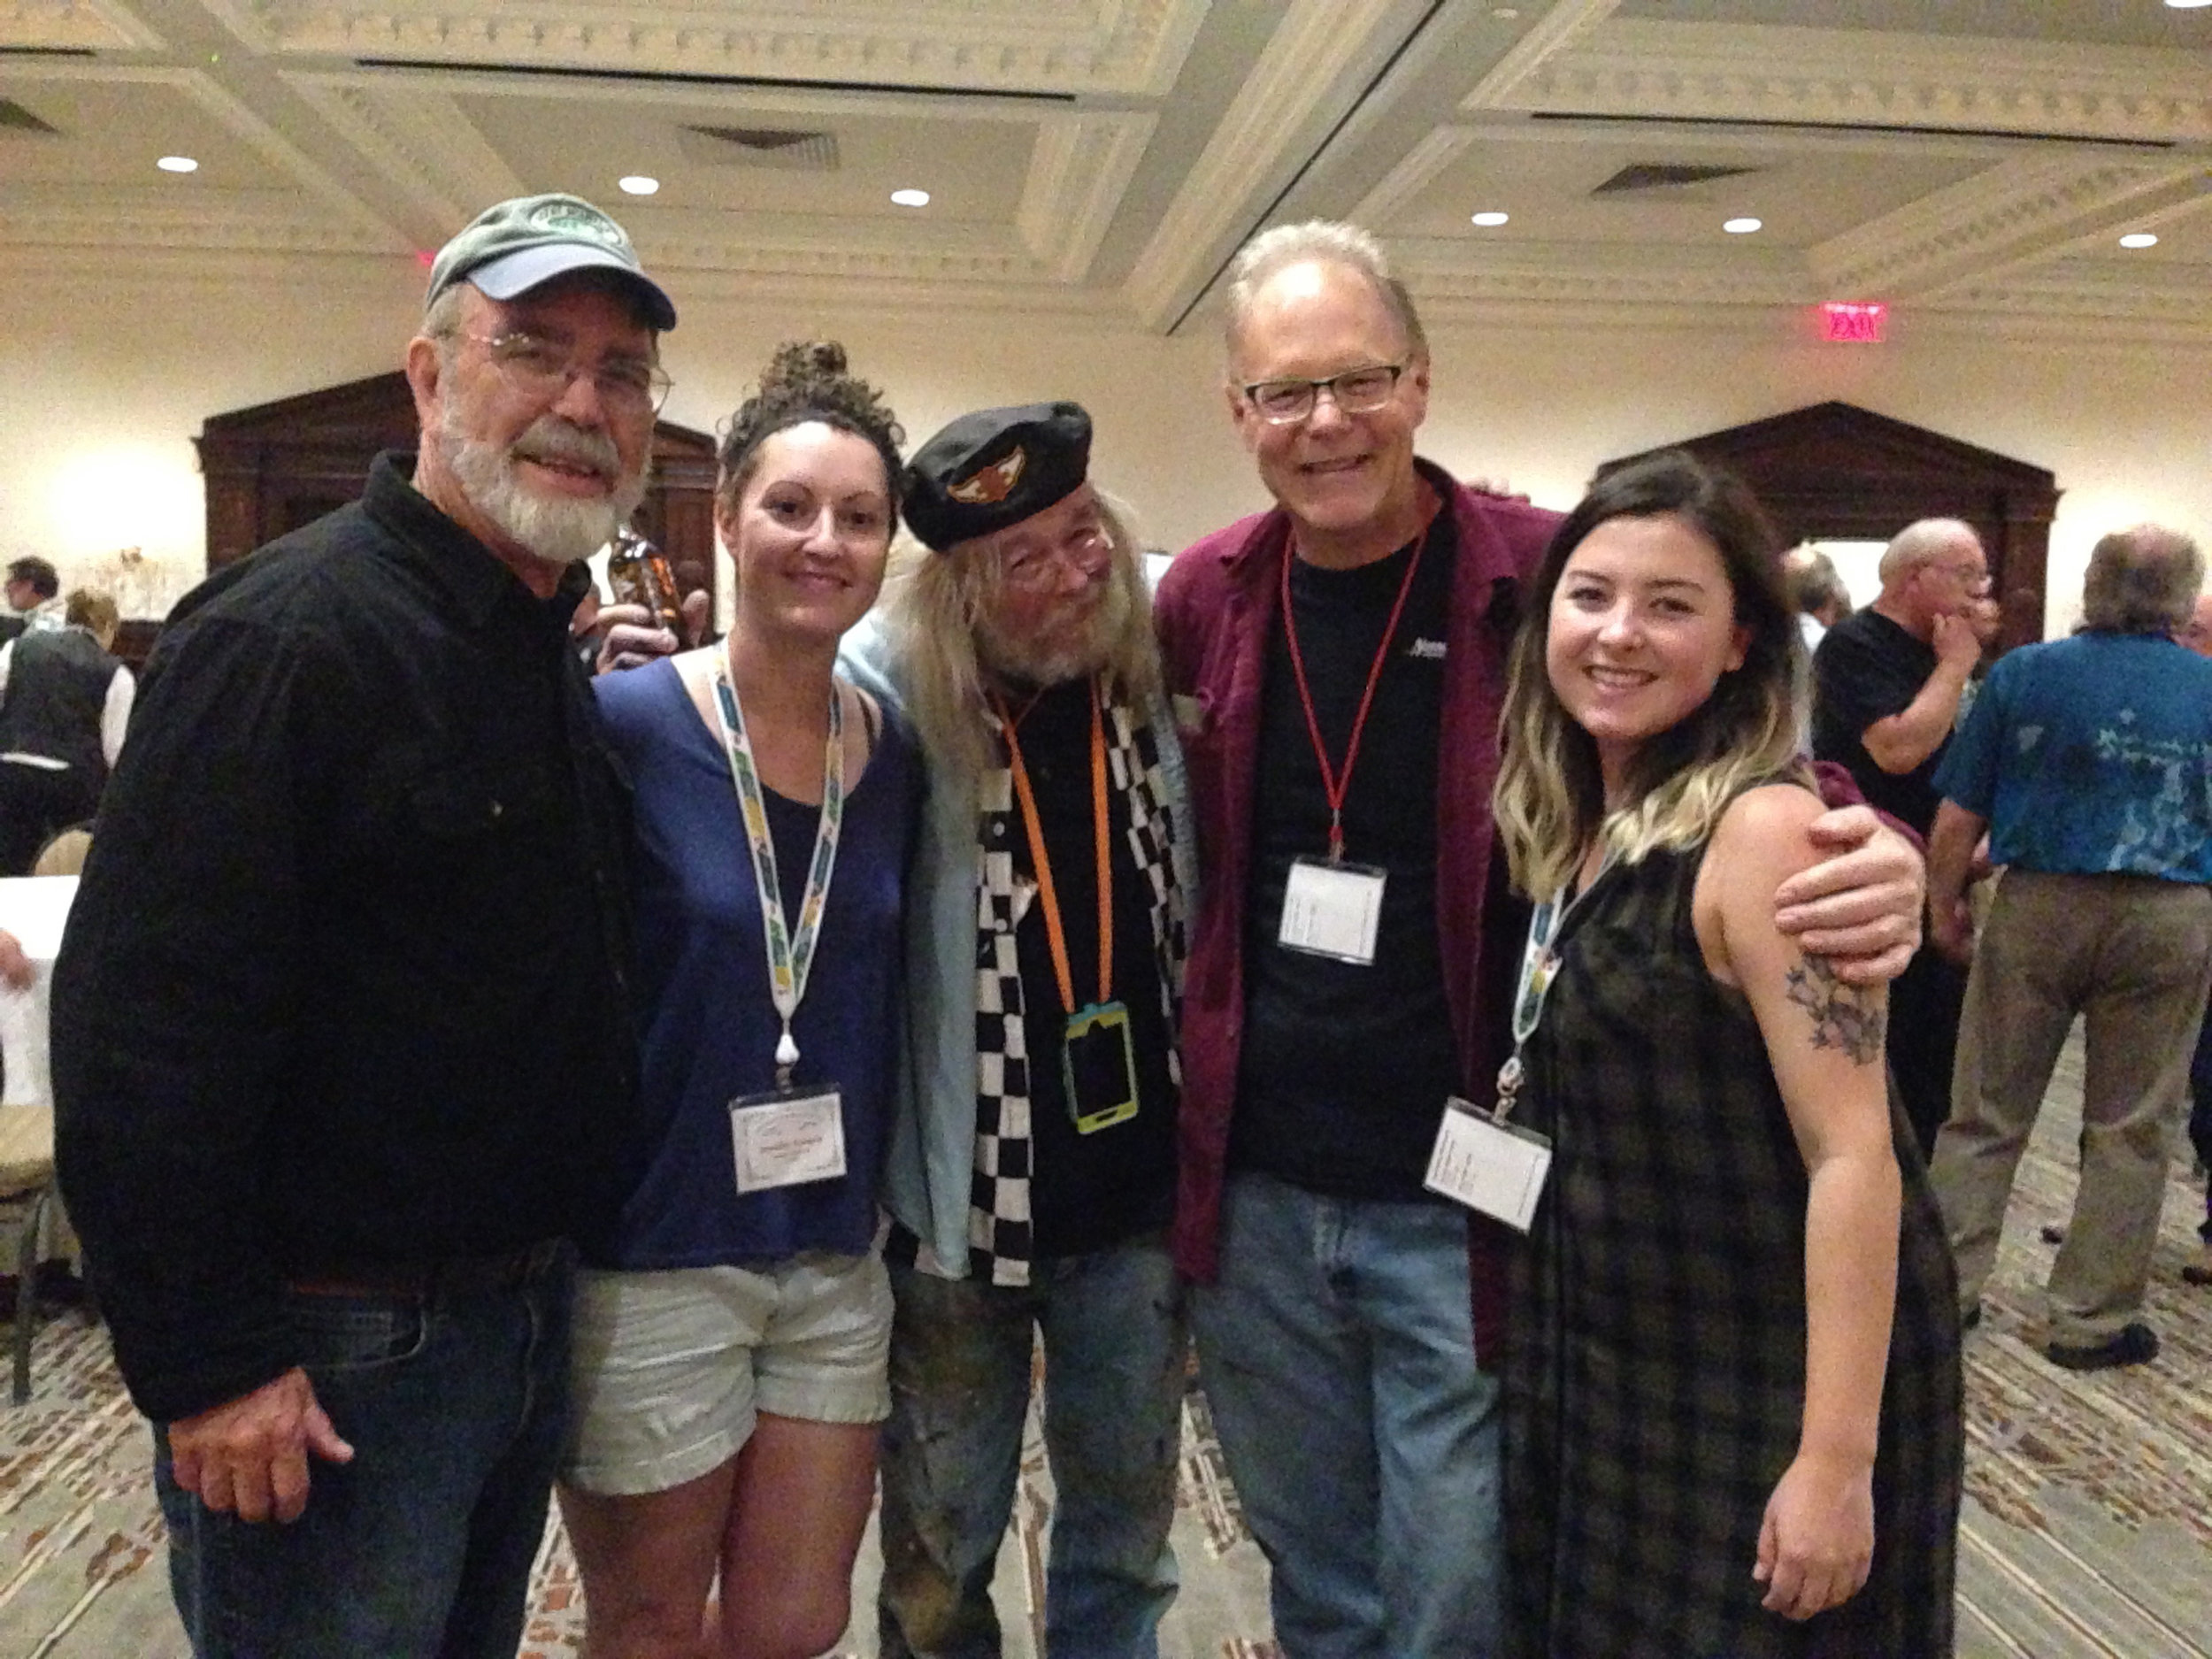 Alan Johnson, Myself, Alton Gillespie, Jeff Williams and Joanna Dawson